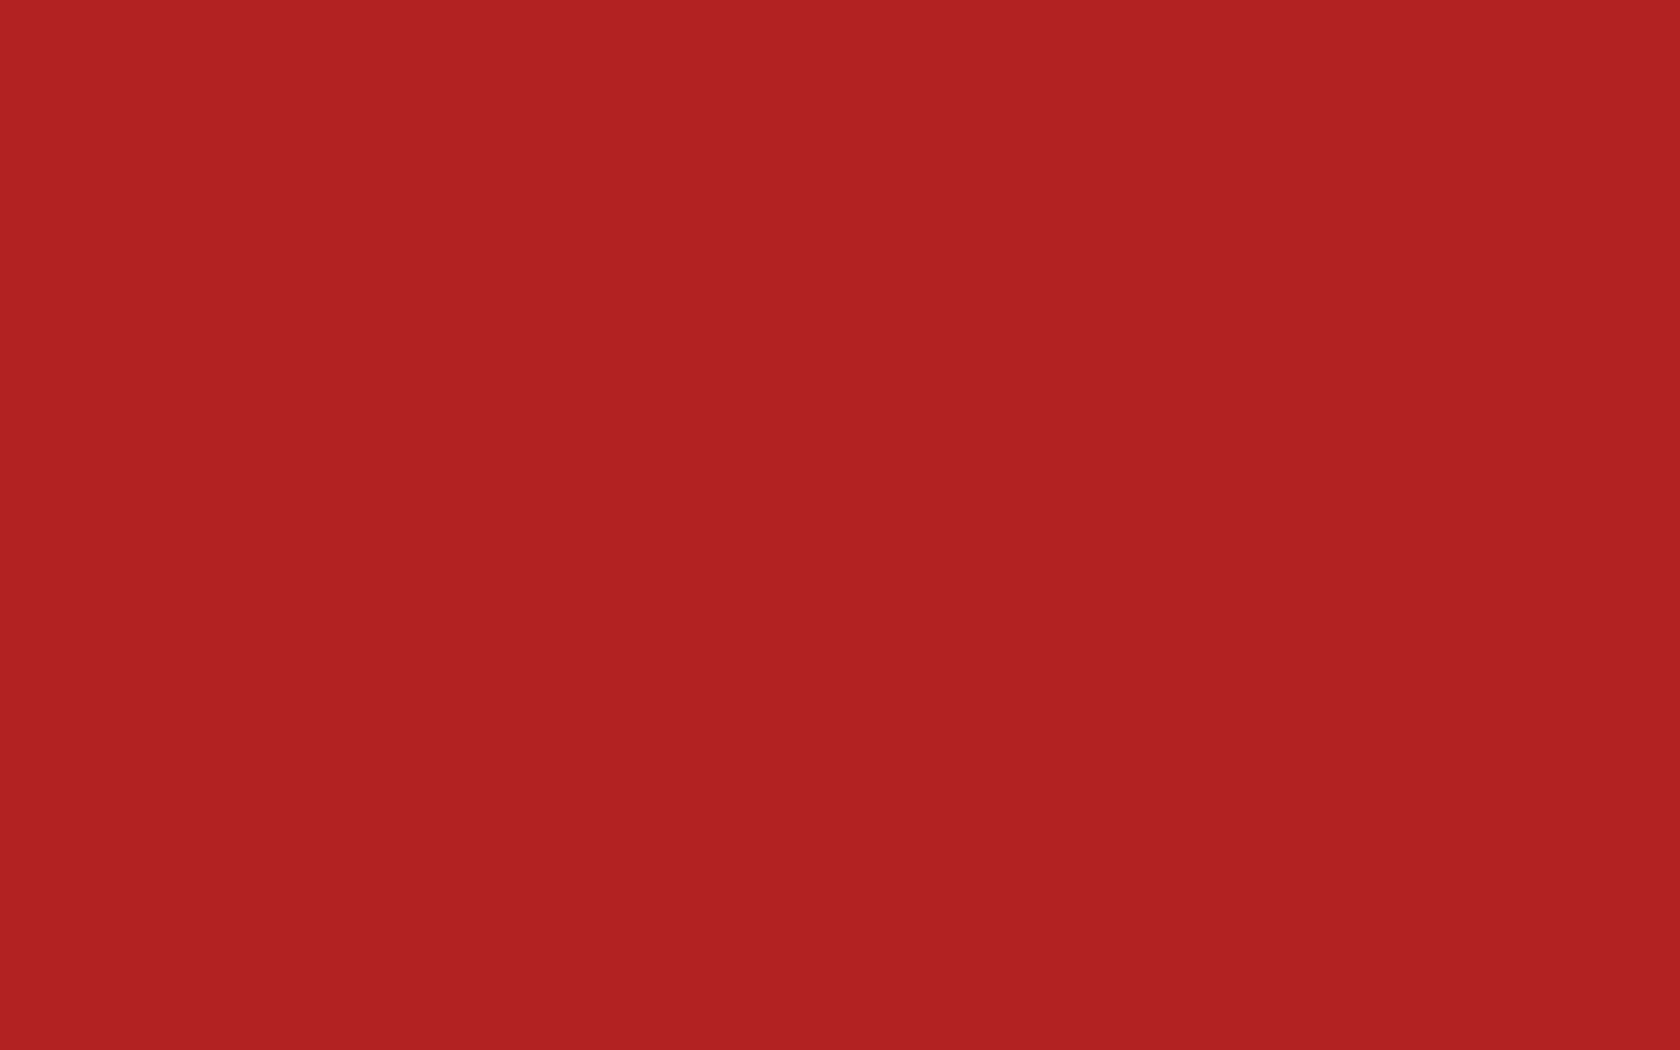 1680x1050 Firebrick Solid Color Background